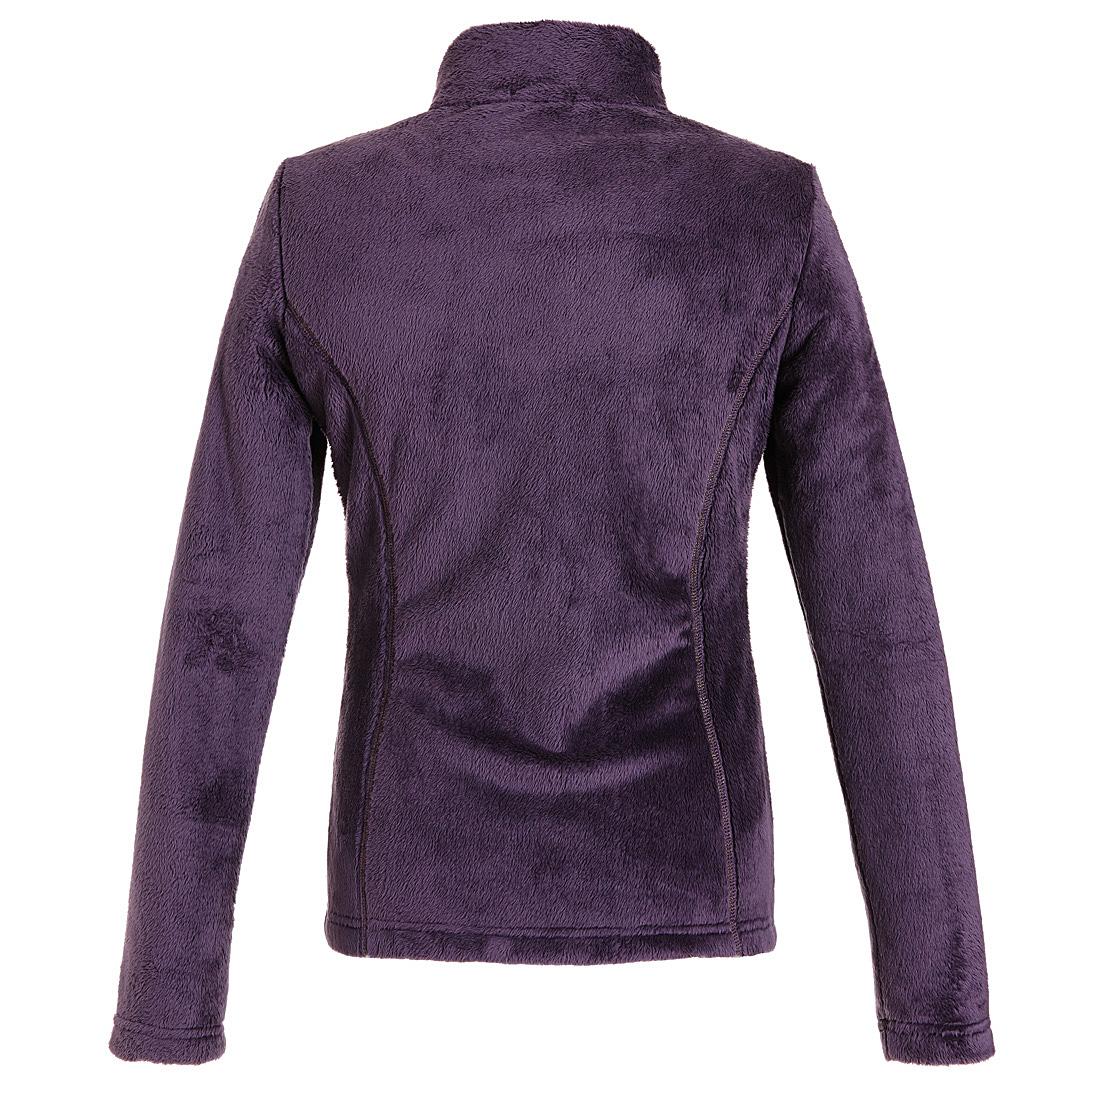 Flauschige Fleece Jacke Violet